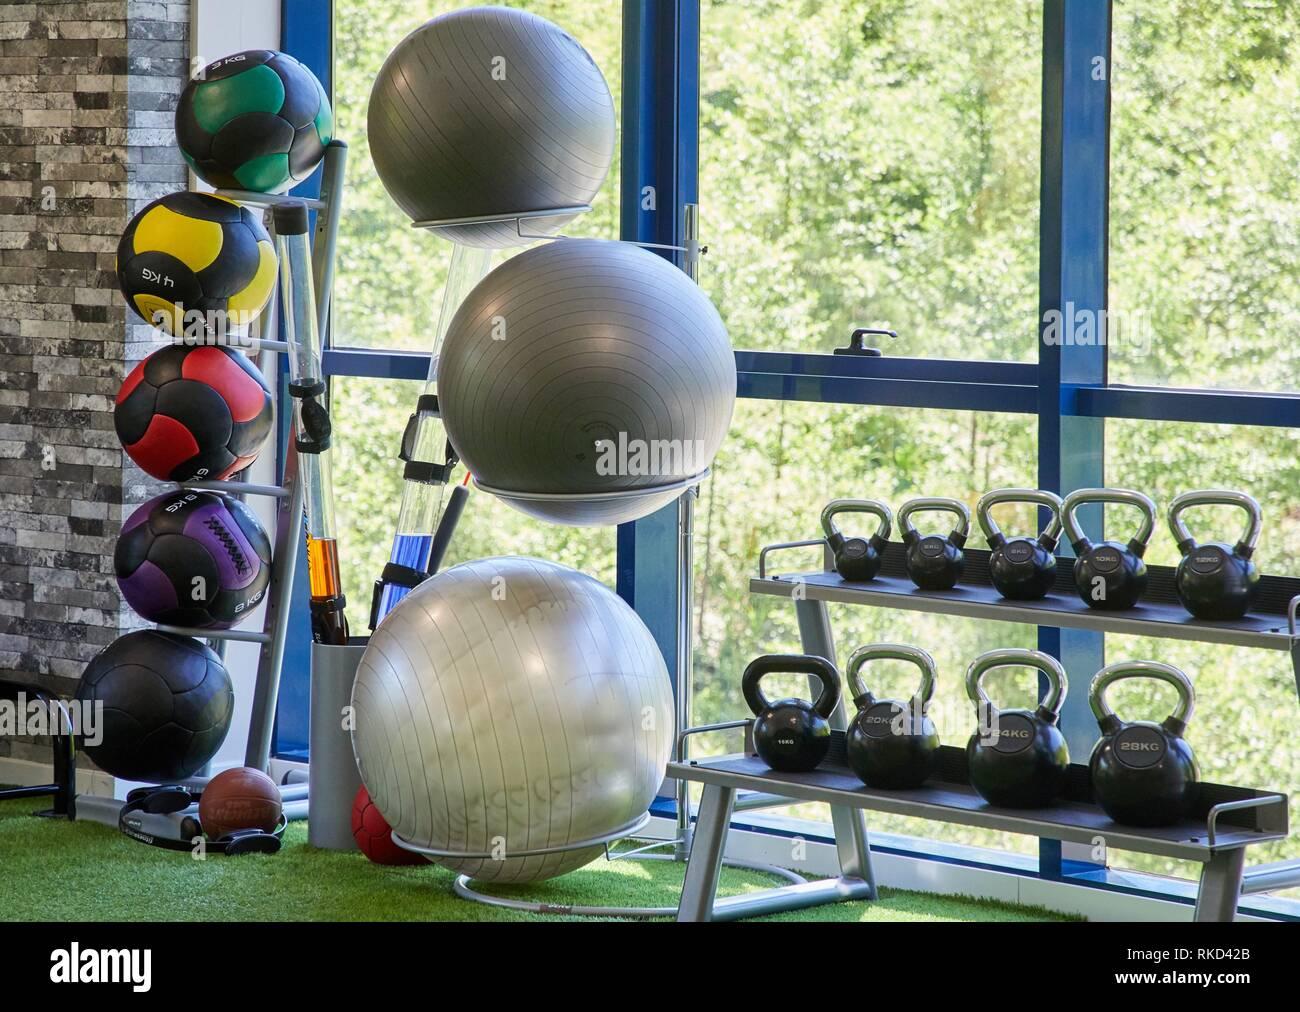 Fitness center, Donostia, San Sebastian, Basque Country, Spain, Europe - Stock Image